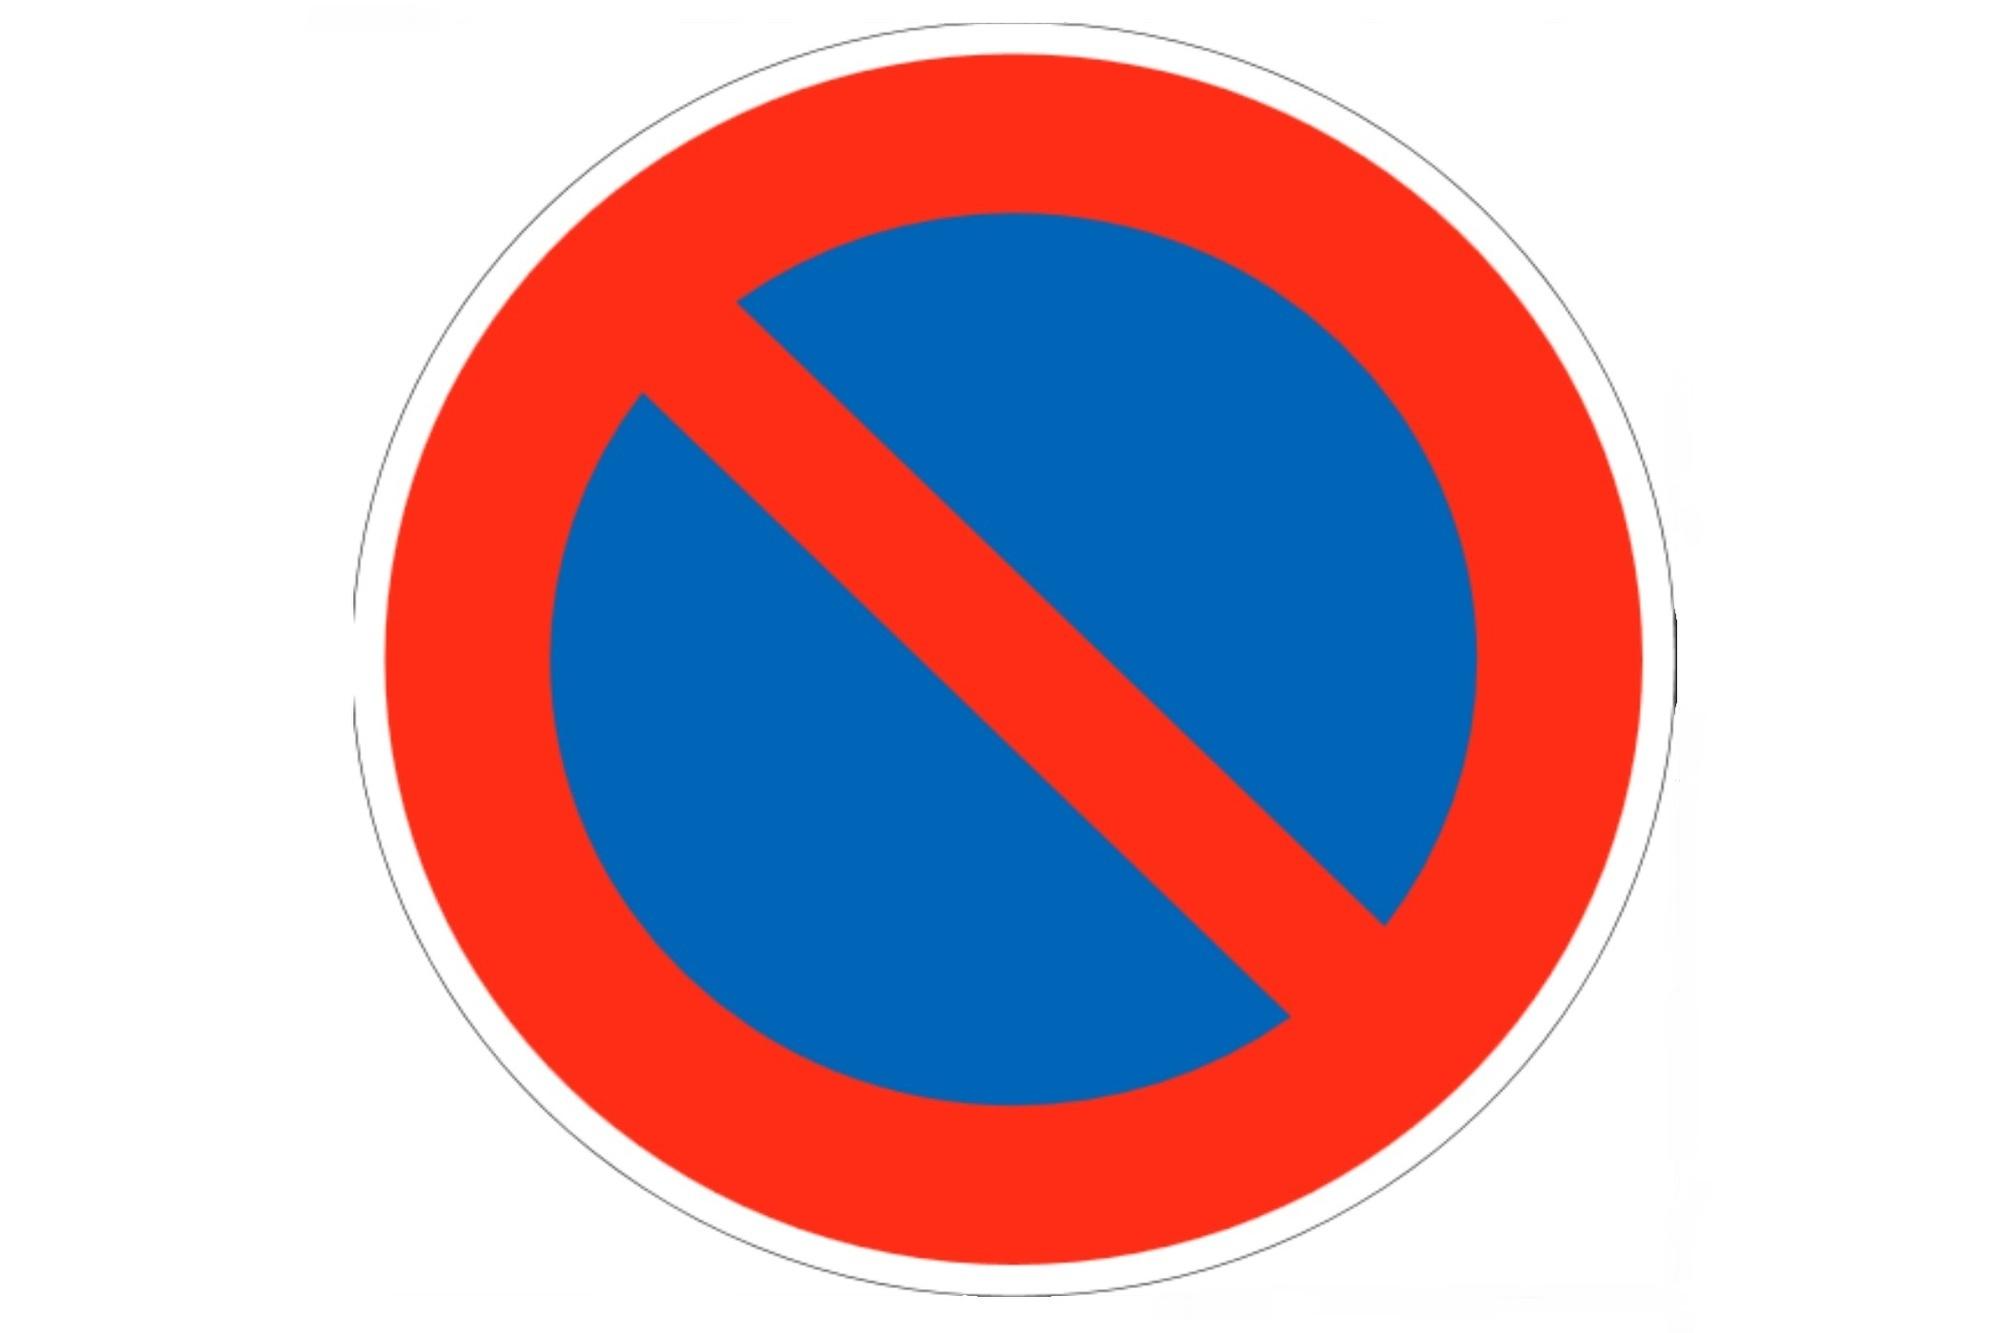 Recht: Parken im Halteverbot - Auch mal länger als 3 Minuten